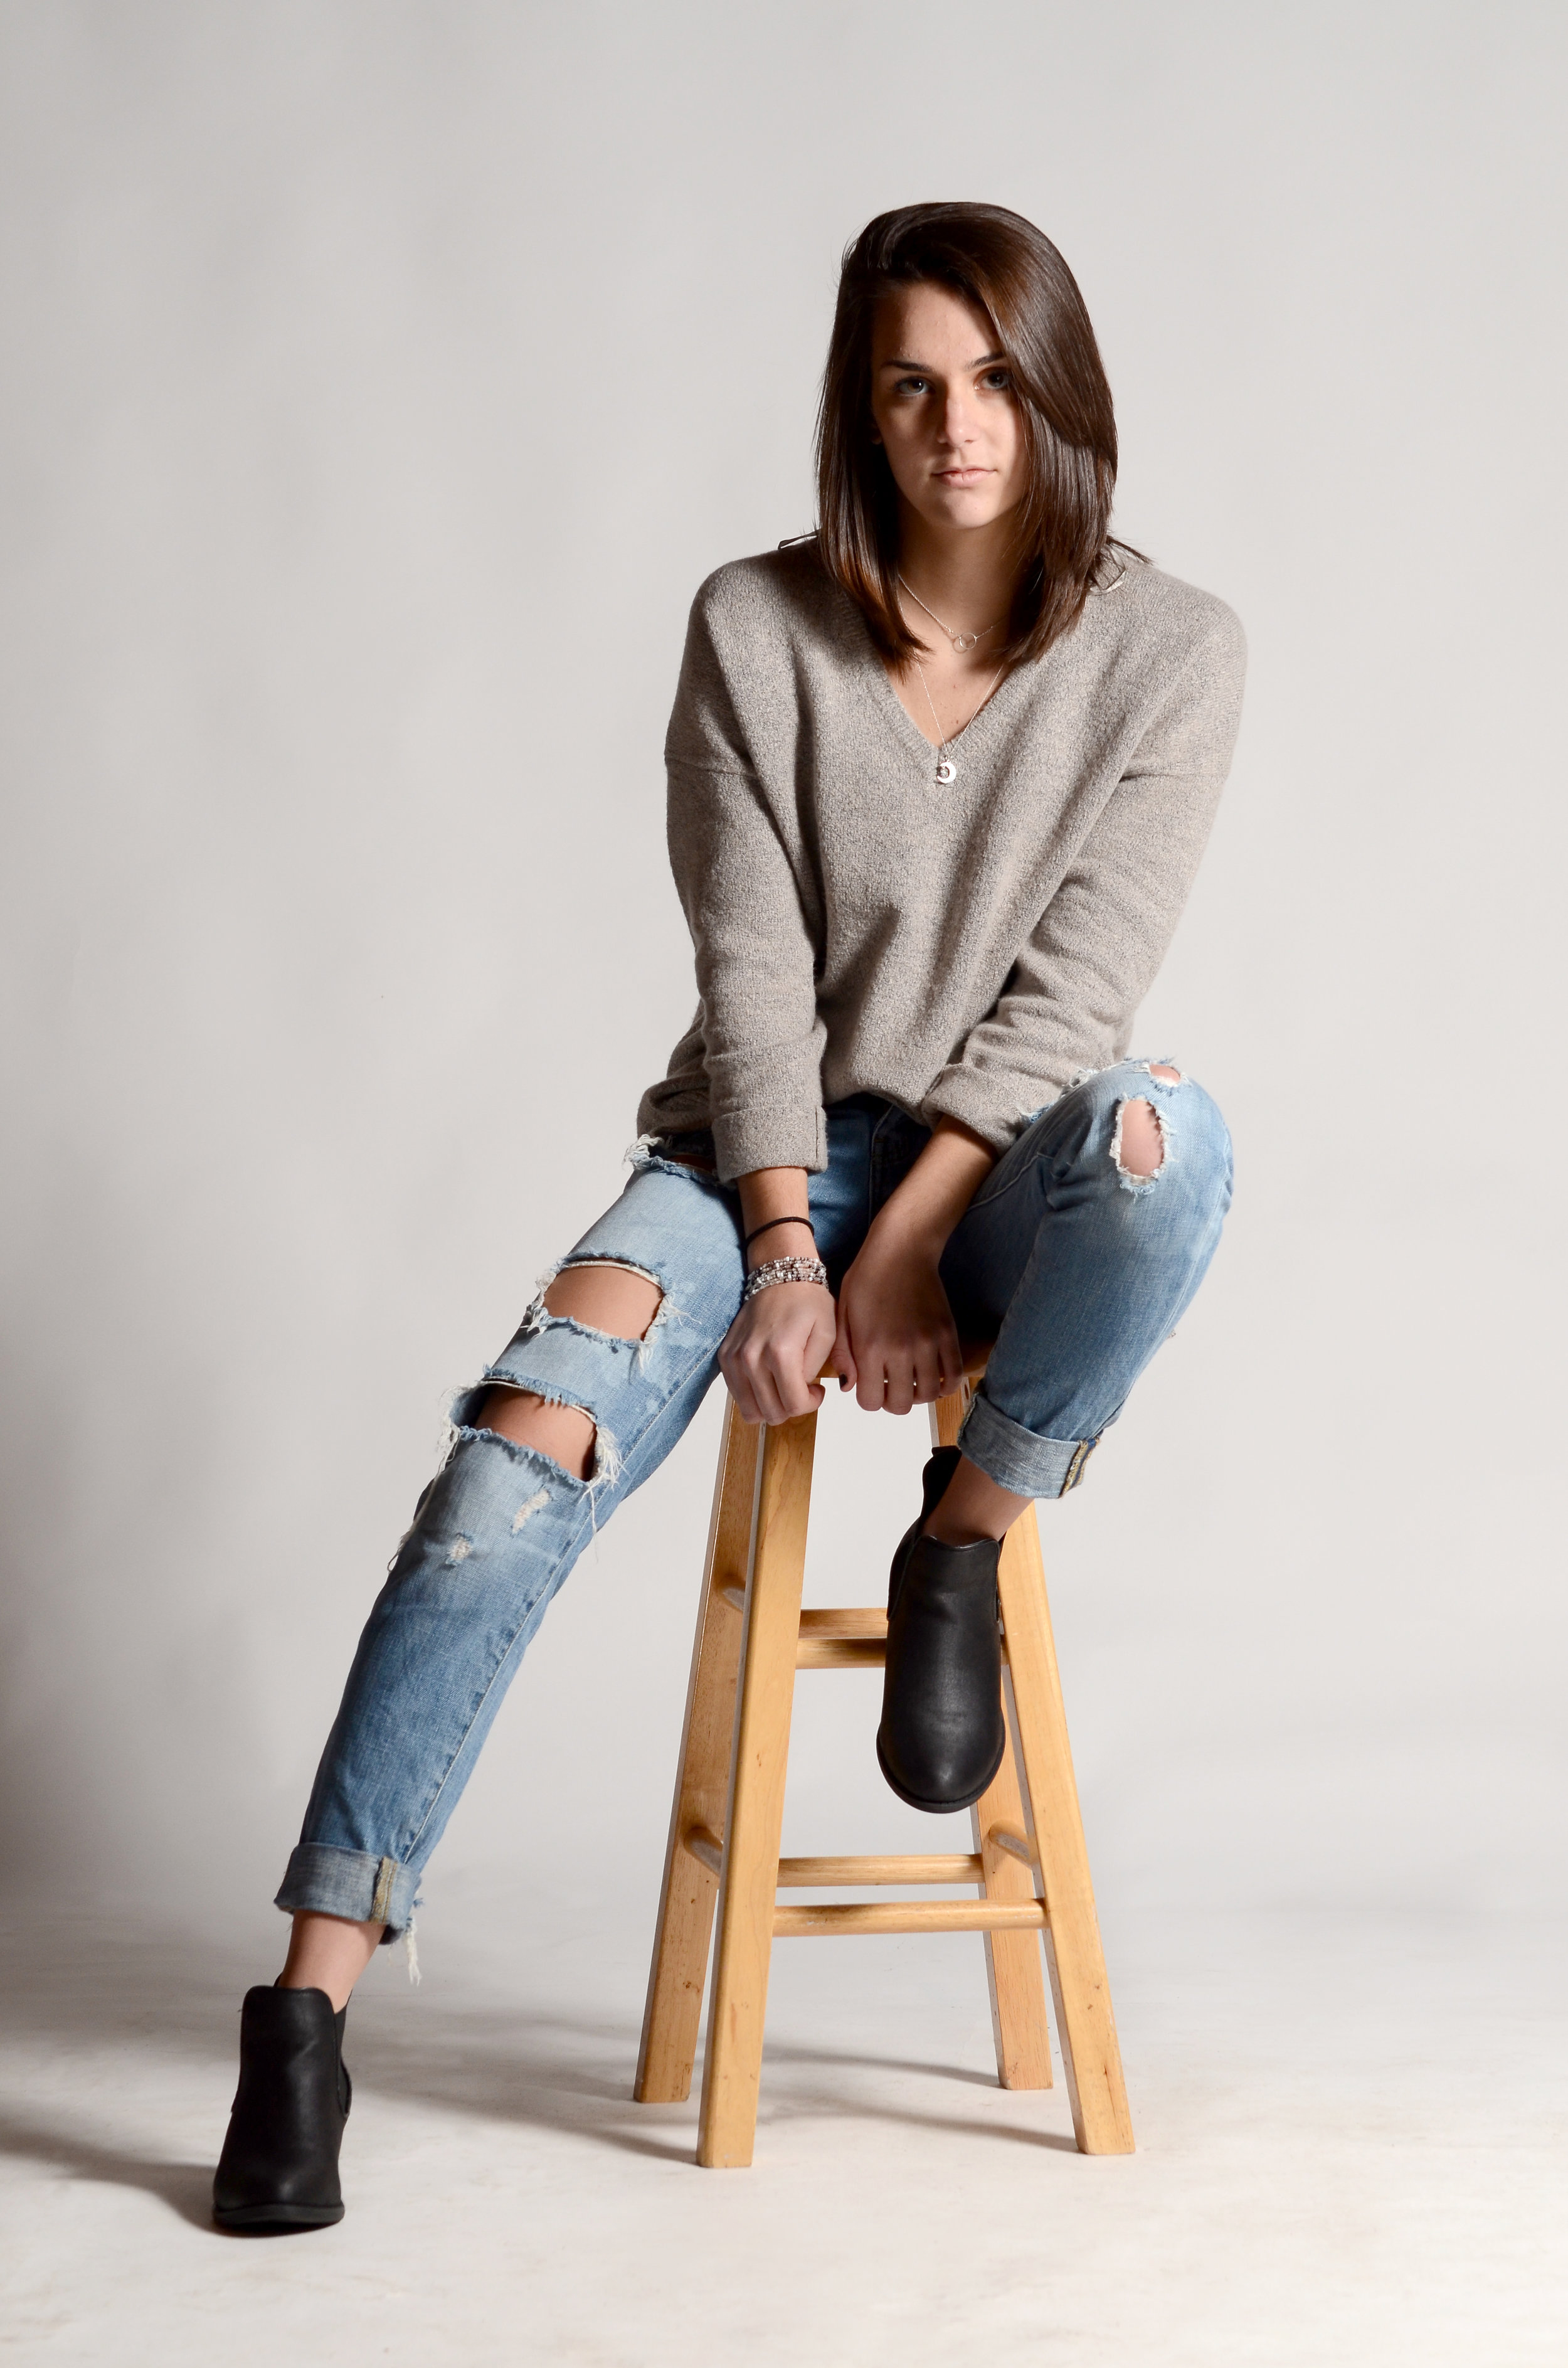 Paige in Studio